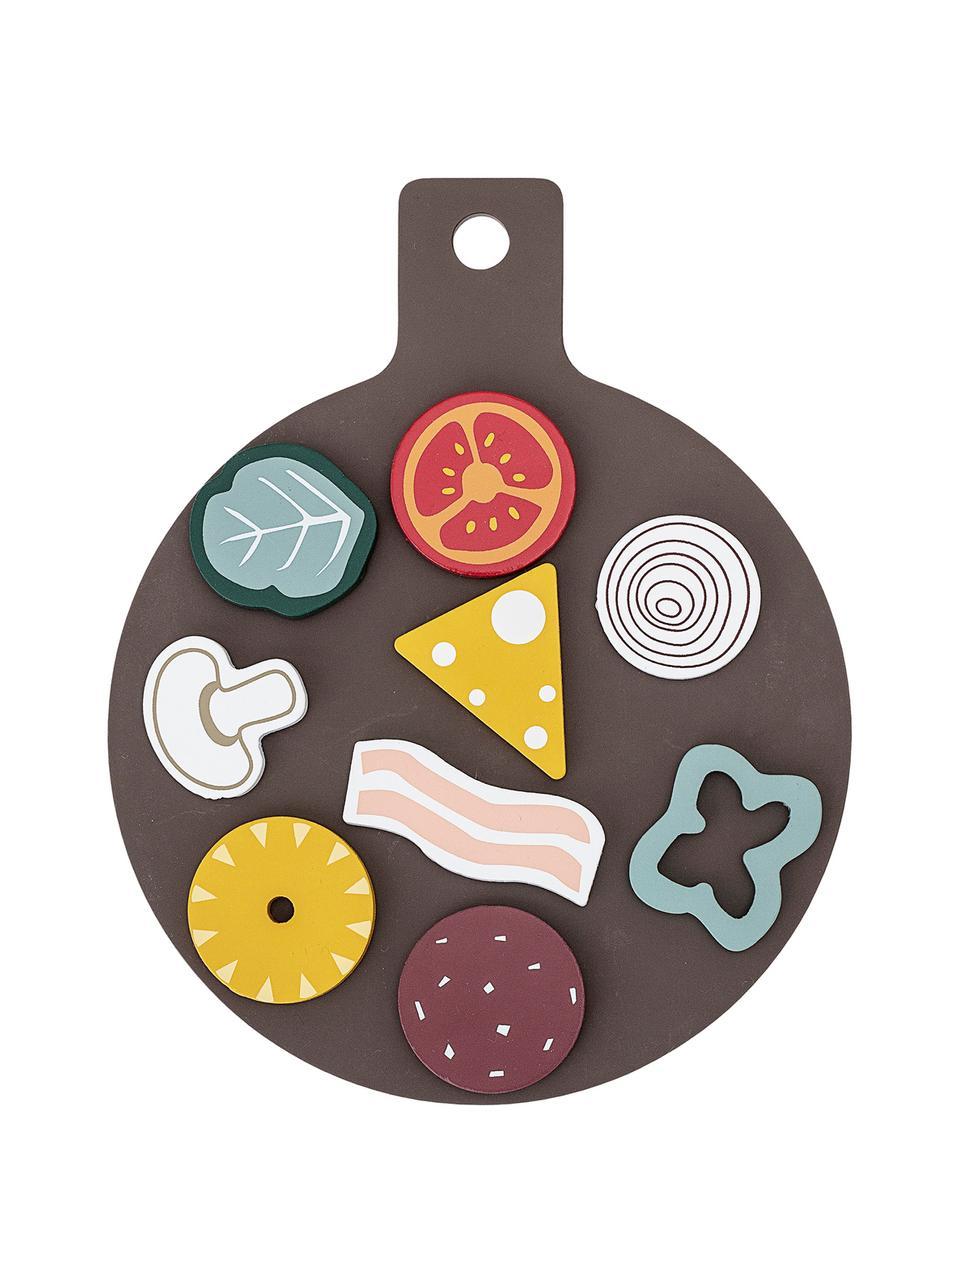 Spiel-Set Pizza, 15-tlg., Schichtholz, Birkenholz, Mehrfarbig, 20 x 3 cm